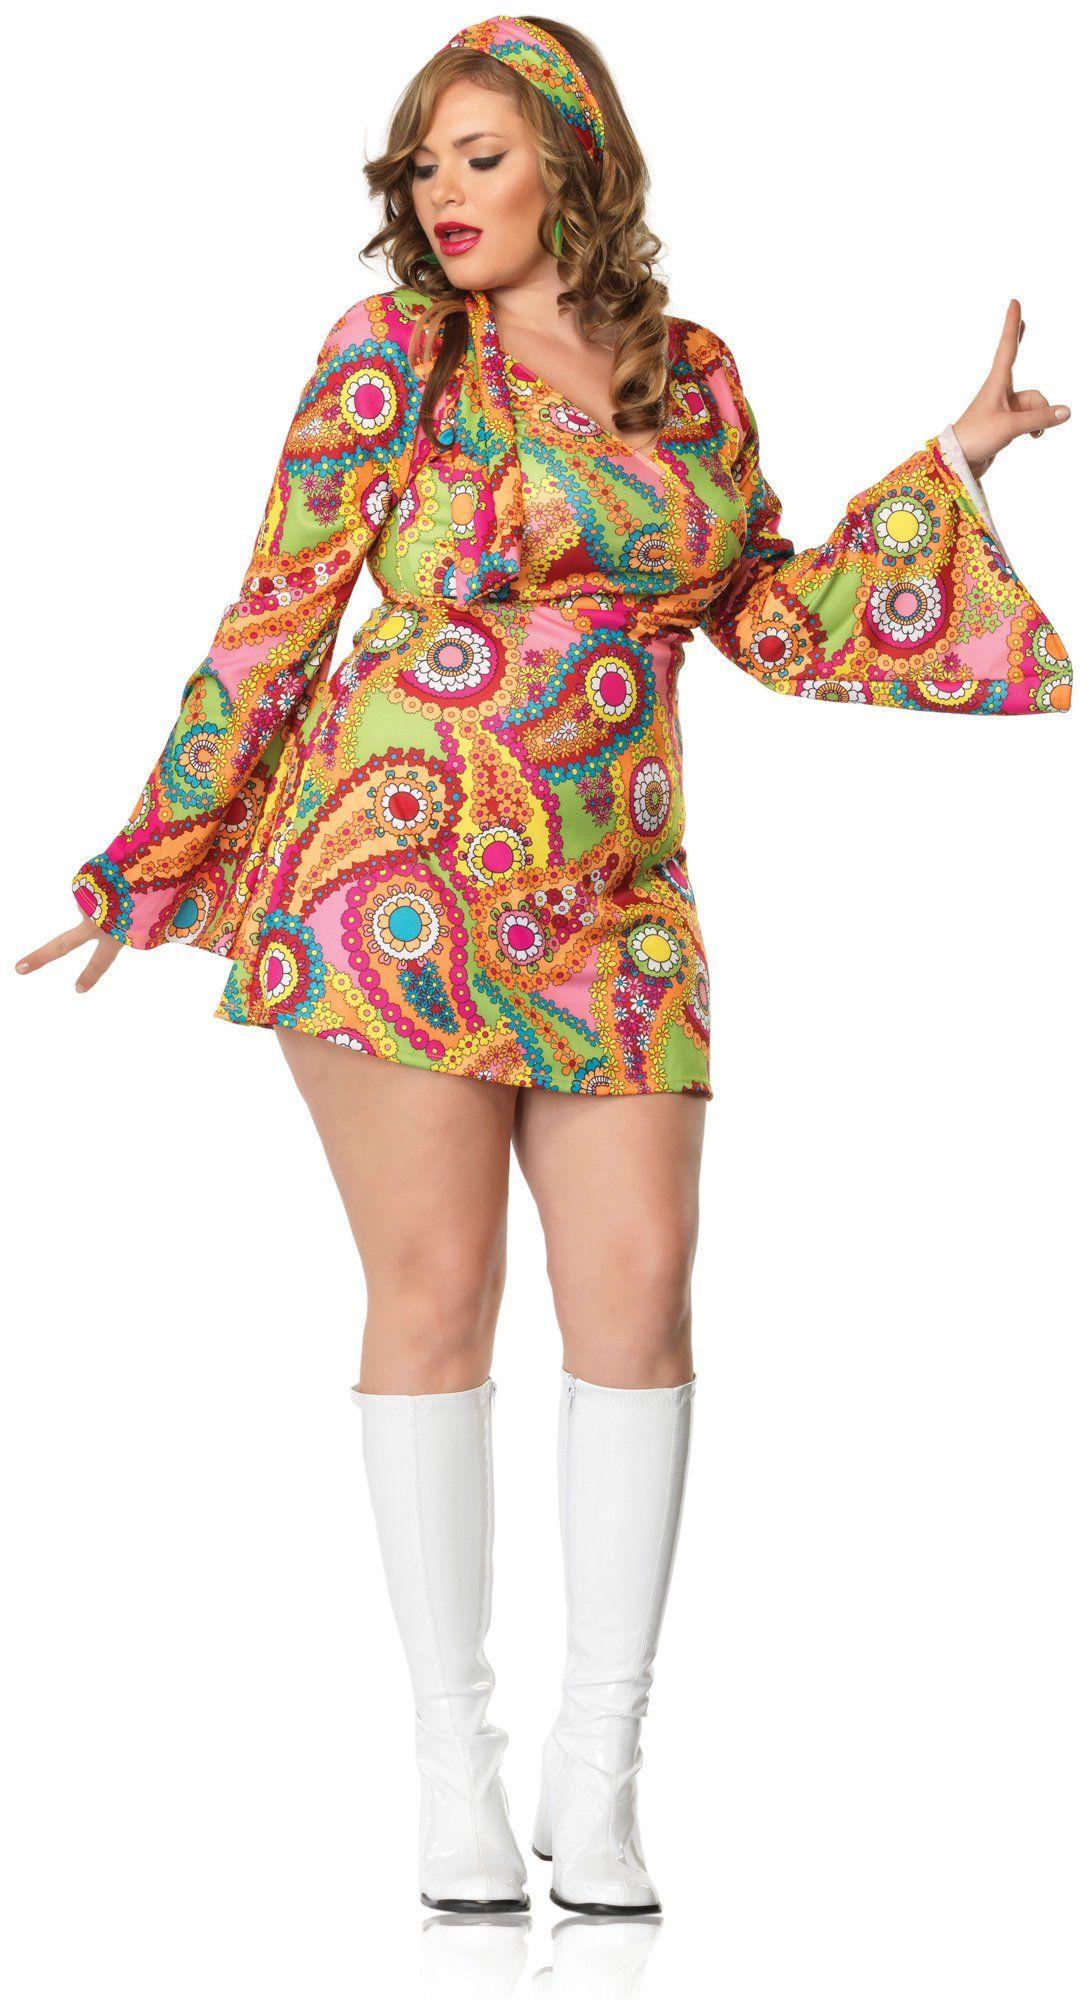 plus size harley quinn dress 1970